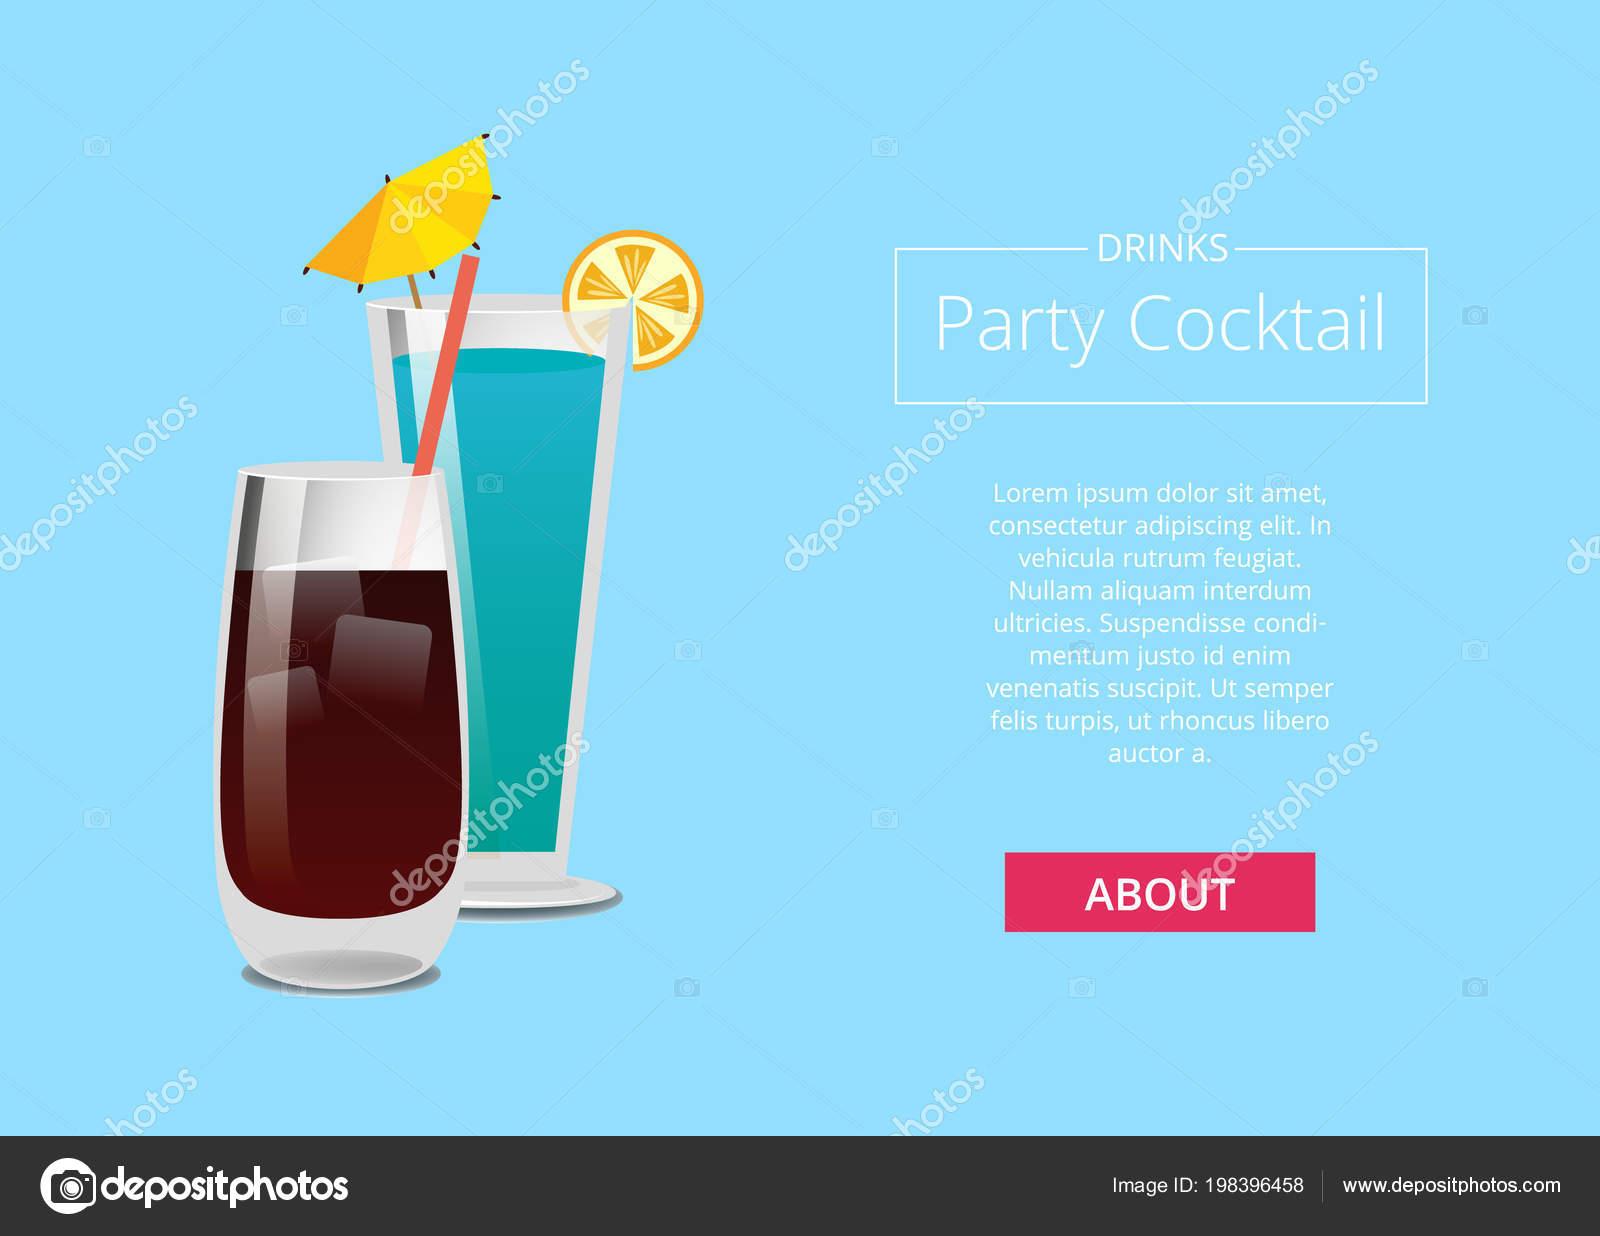 Getränke Party Cocktail Promo Poster mit Getränk — Stockvektor ...